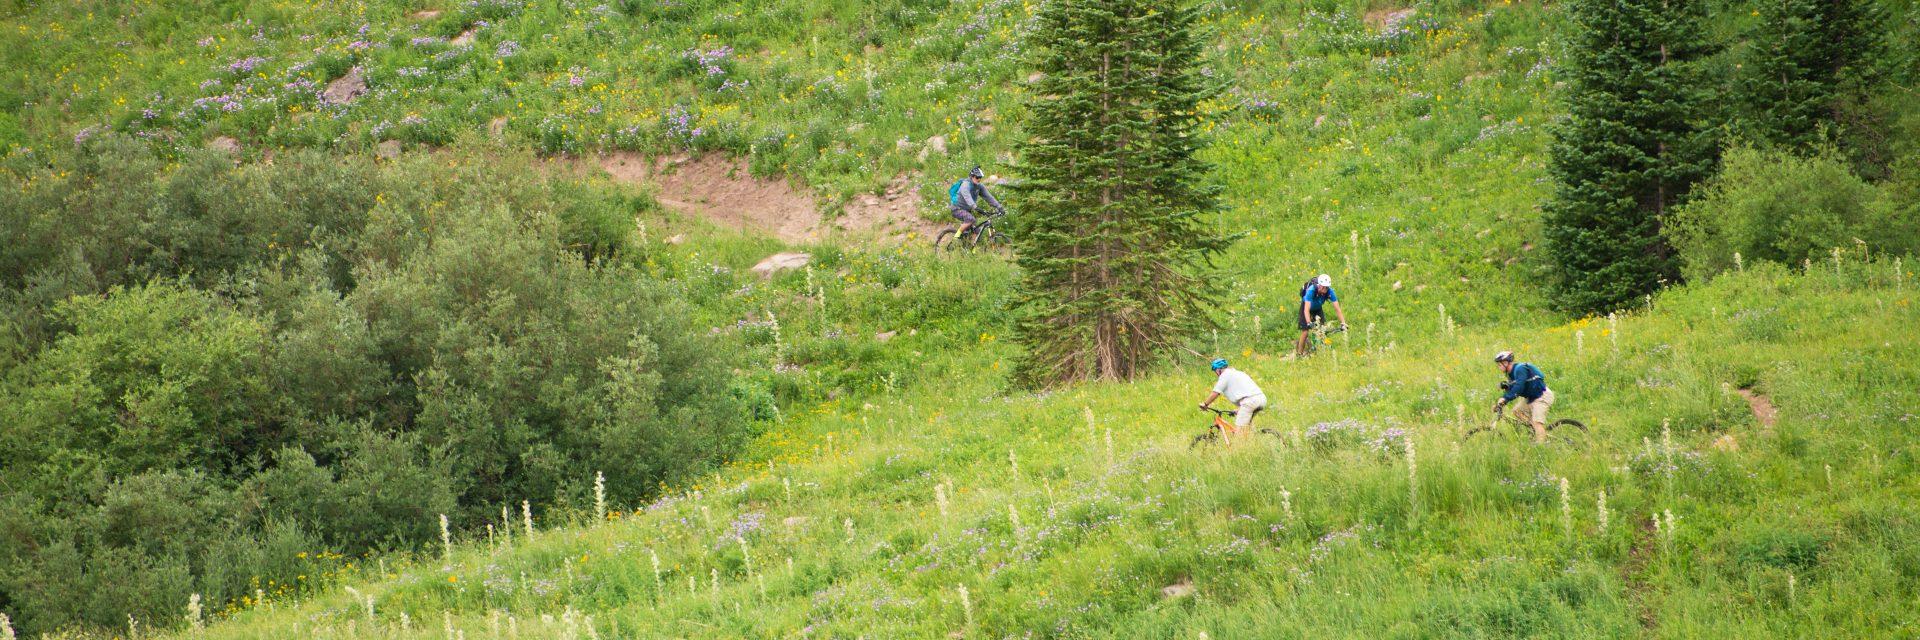 Approaching Burro Pass climb, Geyer Pass, La Sal Mts, The Whole Enchilada